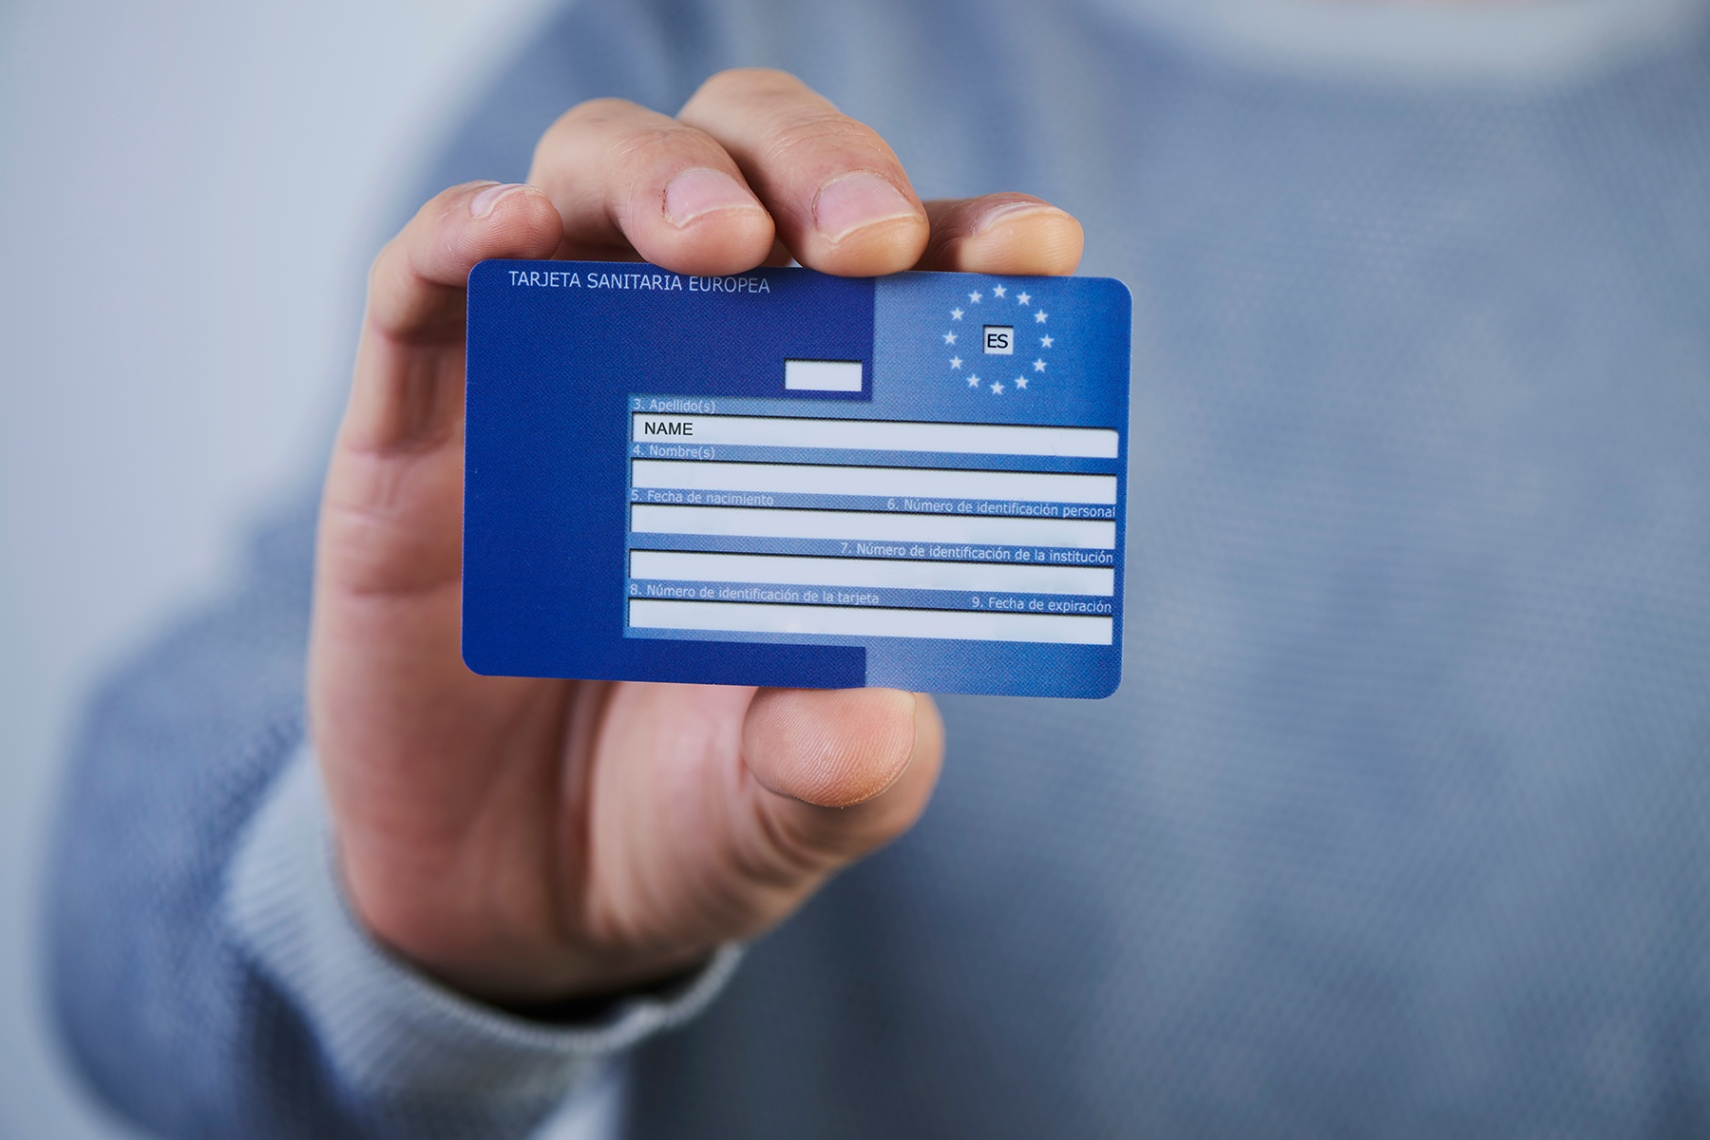 European Health Insurance Card - How to Order